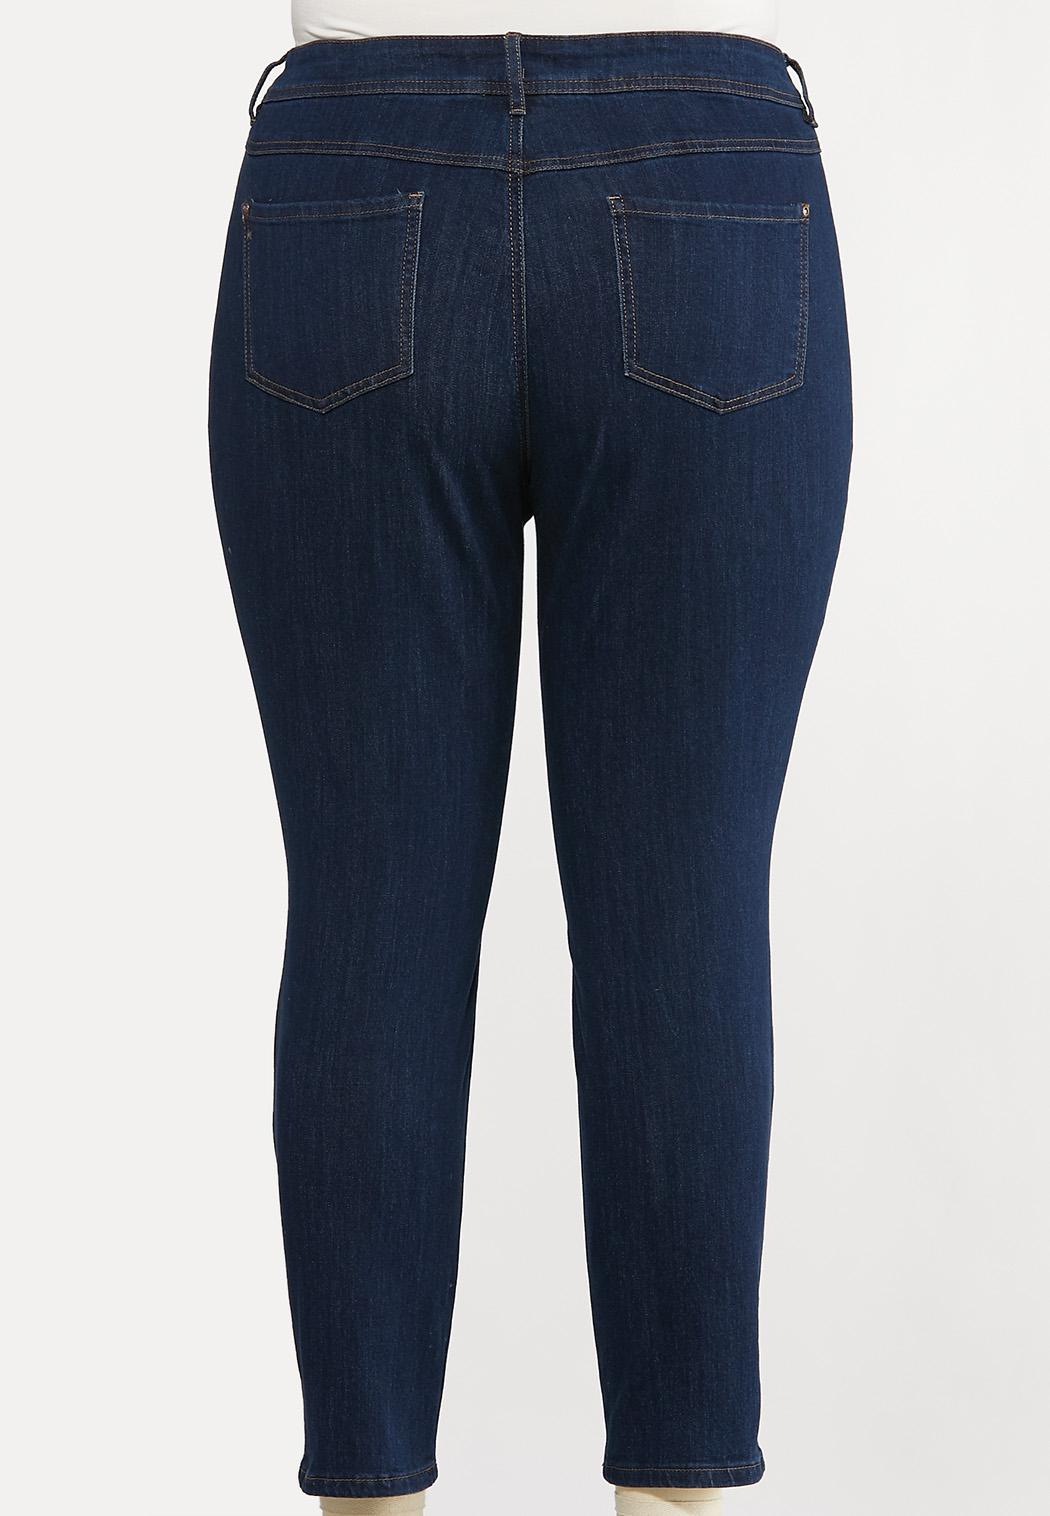 Plus Petite Curvy Skinny Jeans (Item #44079485)